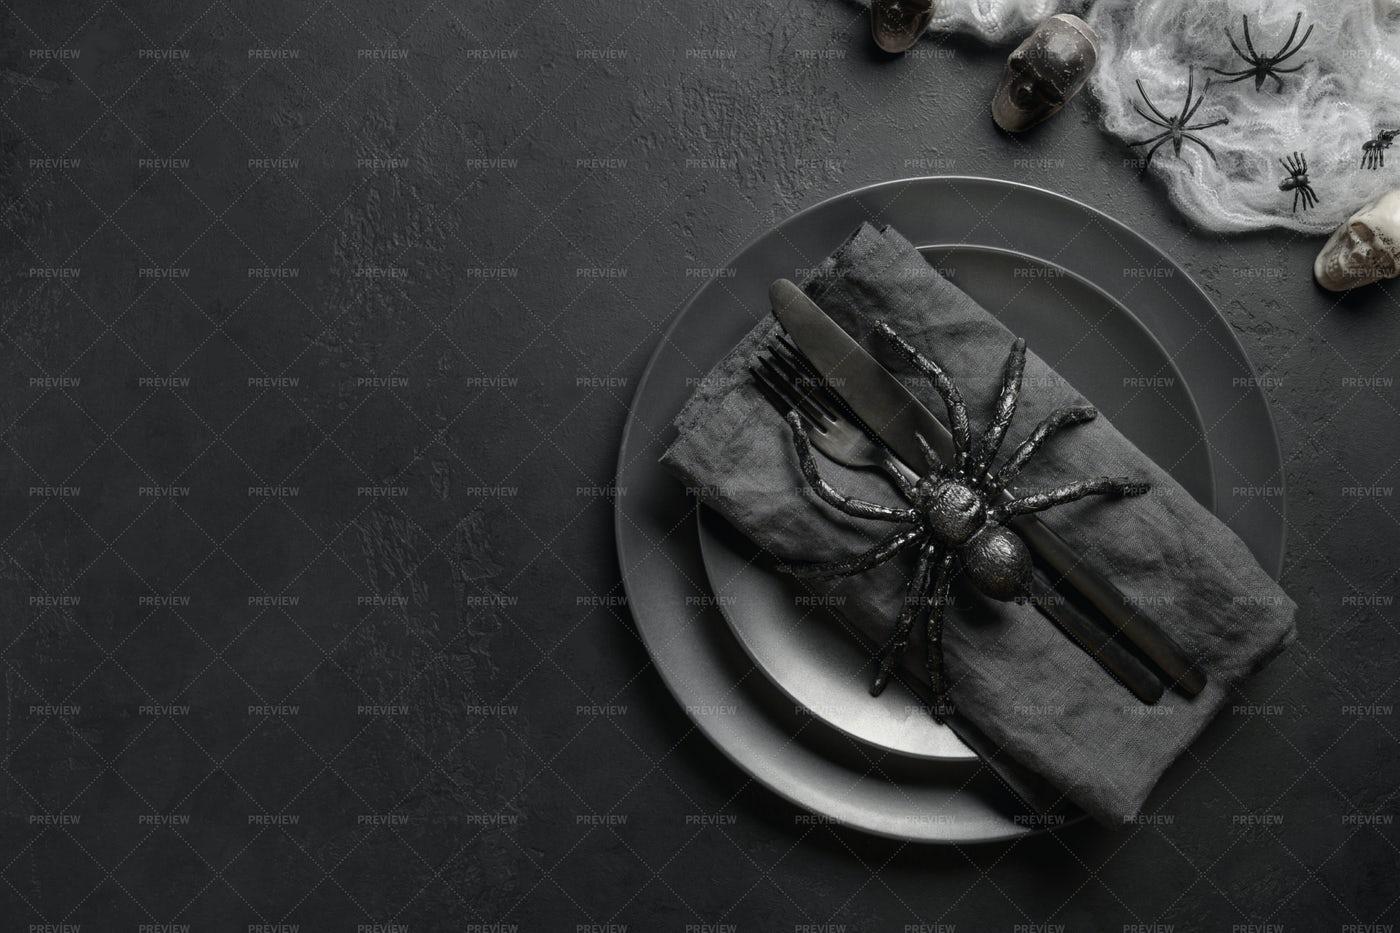 Festive Halloween Black Table Setting: Stock Photos